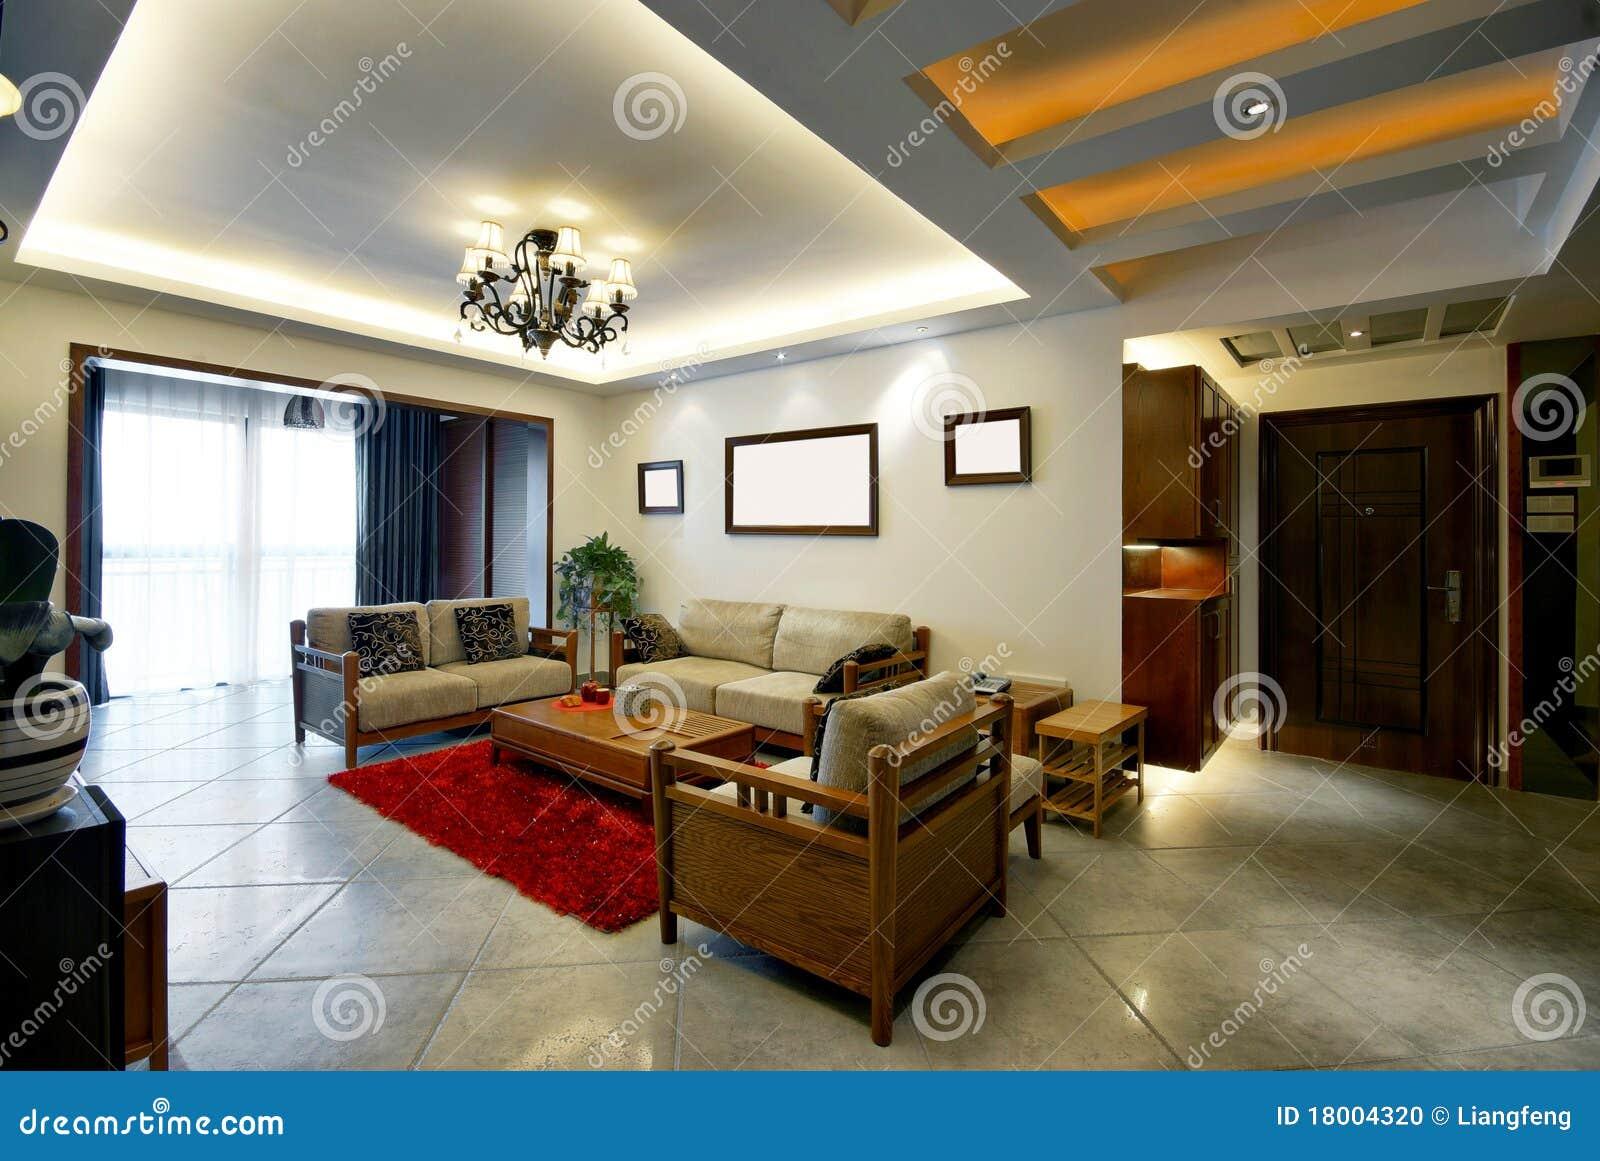 Beautiful Home Decor Stock Photo Image 18004320